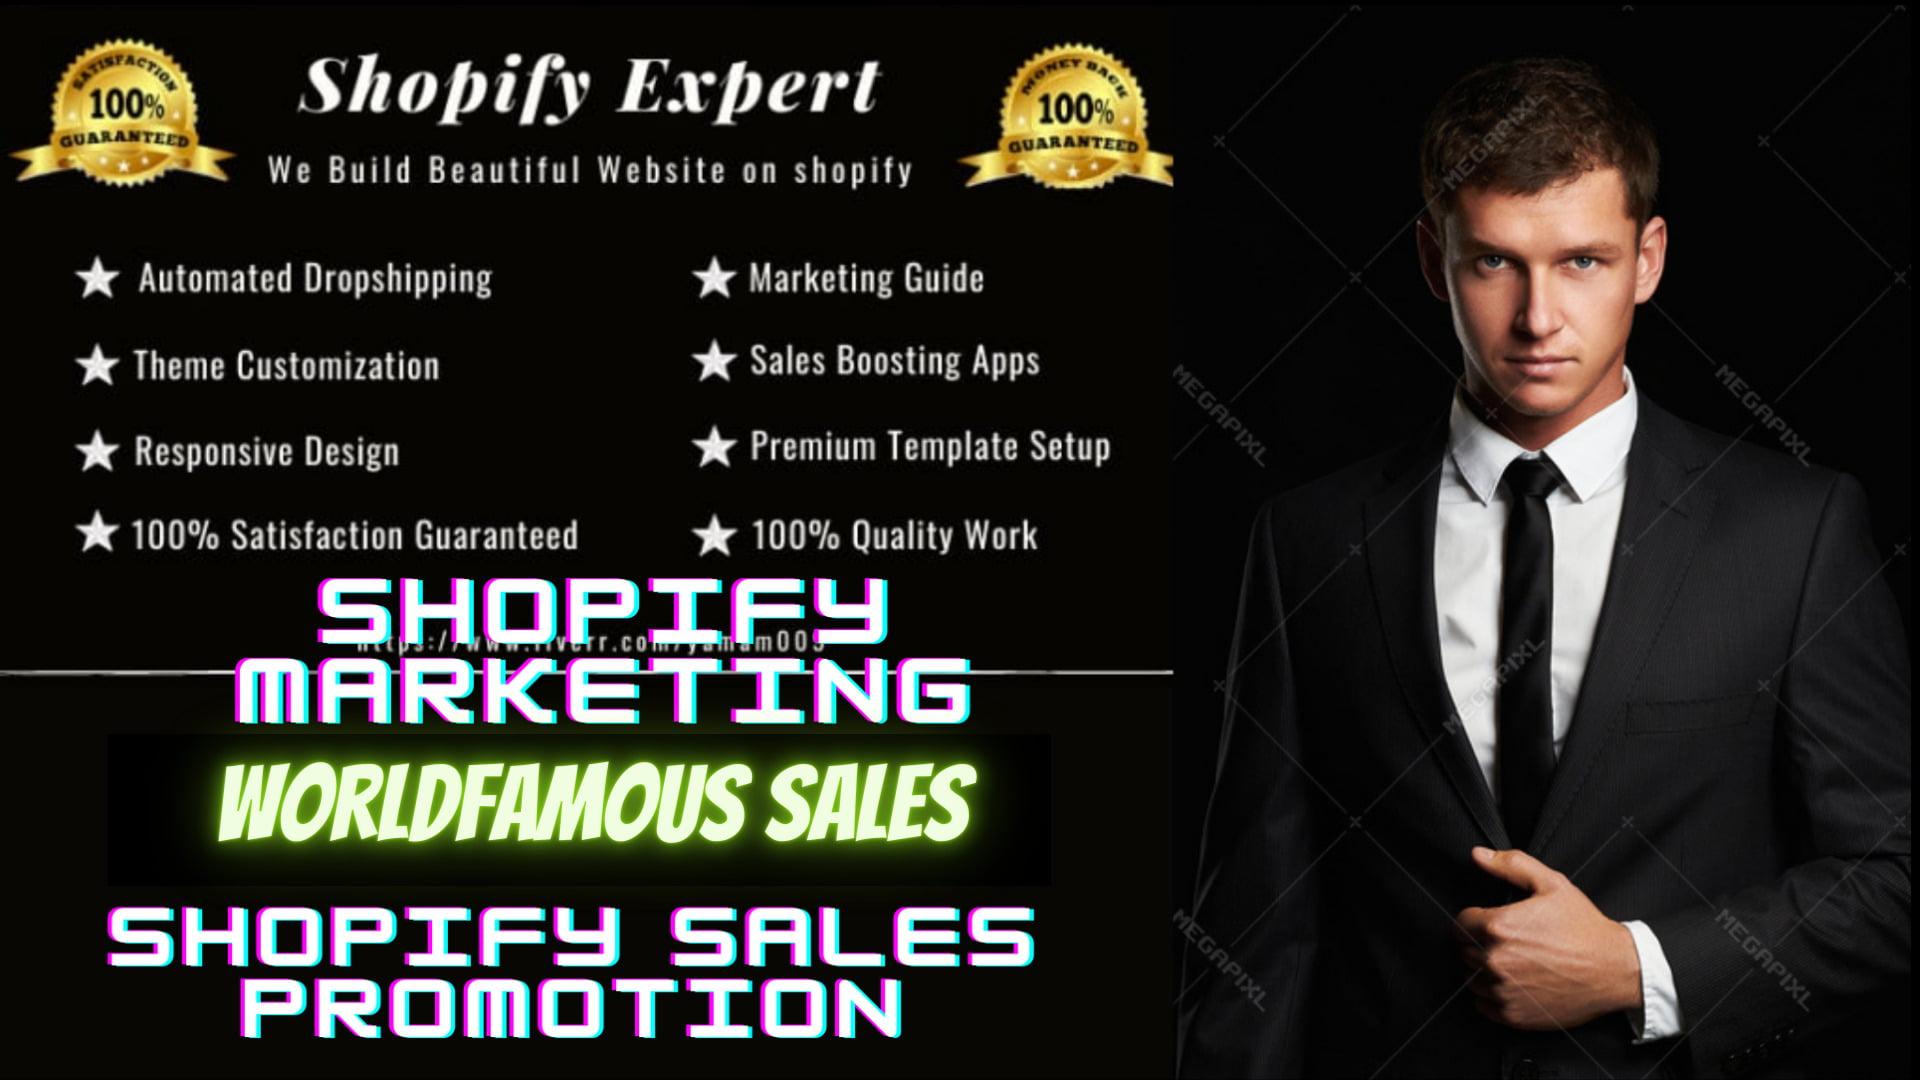 I will shopify marketing shopify promotiom shopify sales, FiverrBox